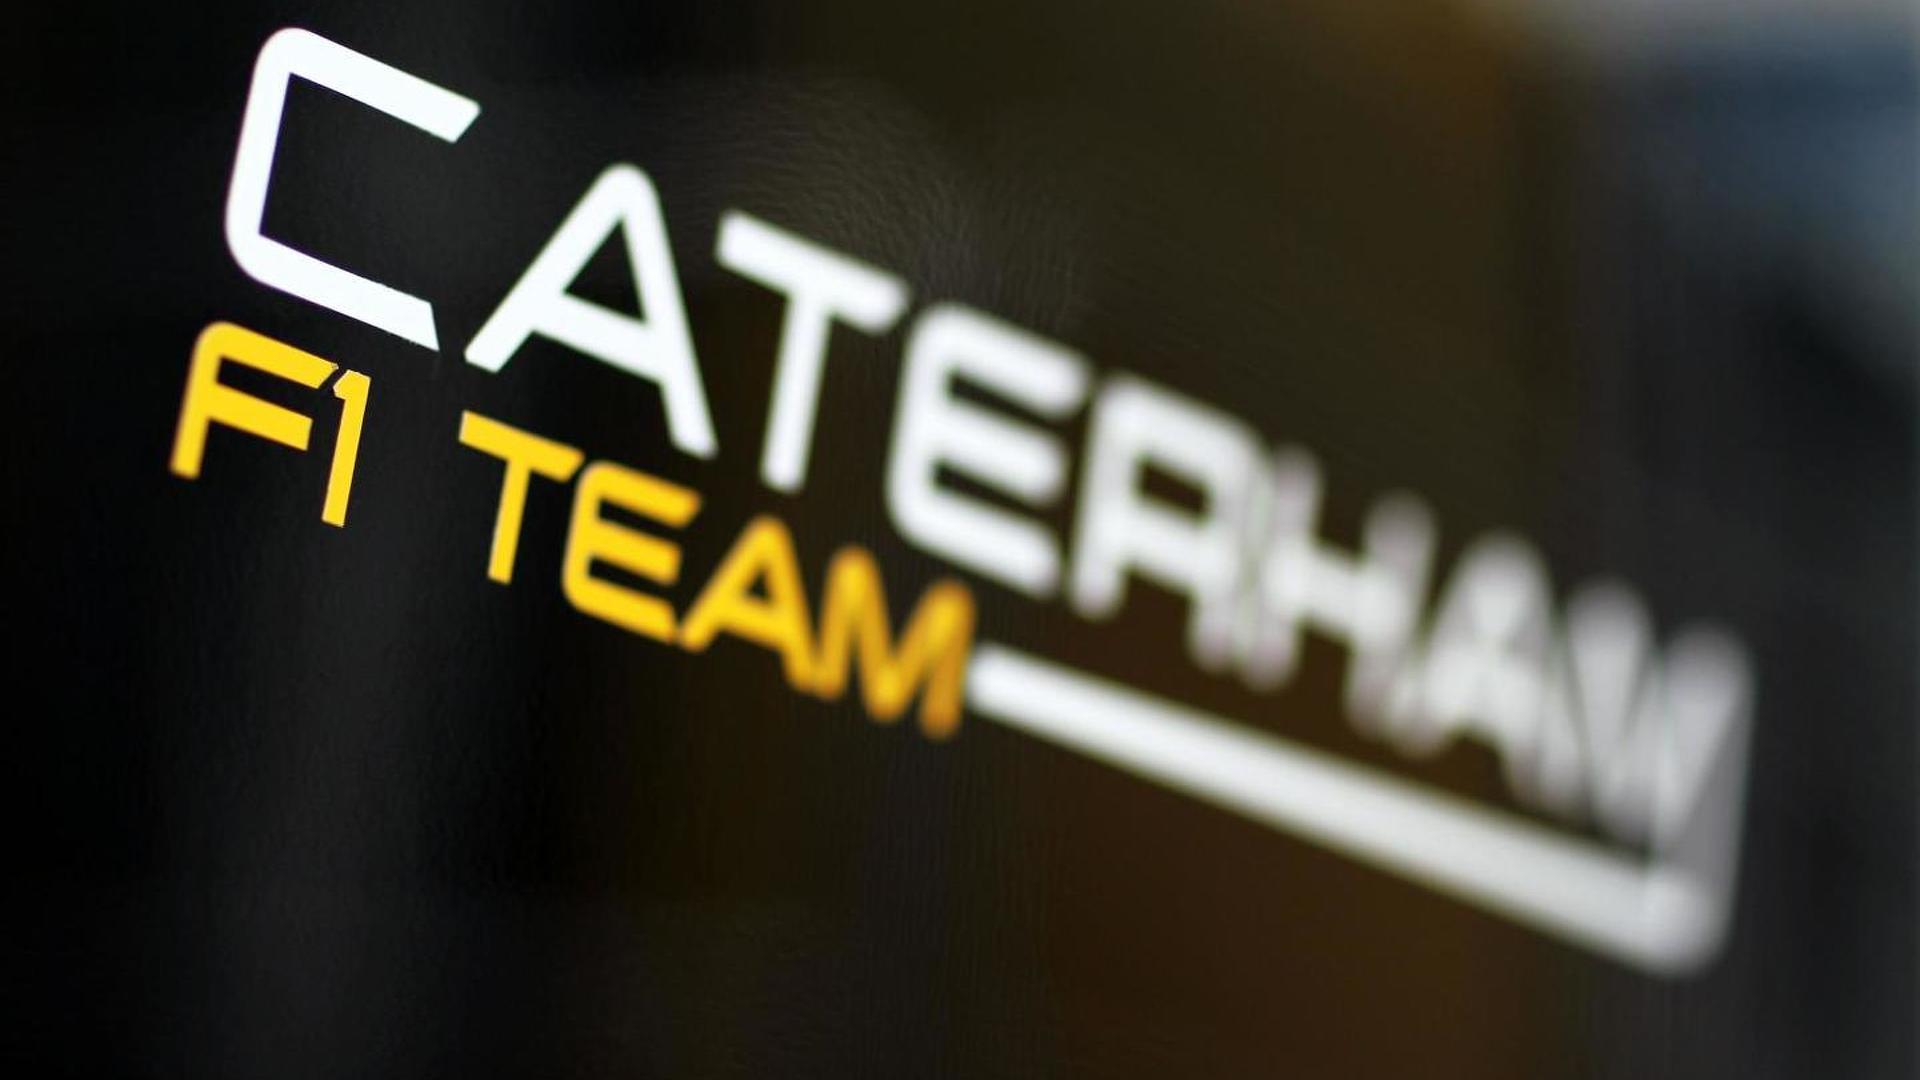 Caterham not just after 'quick money' - Frijns